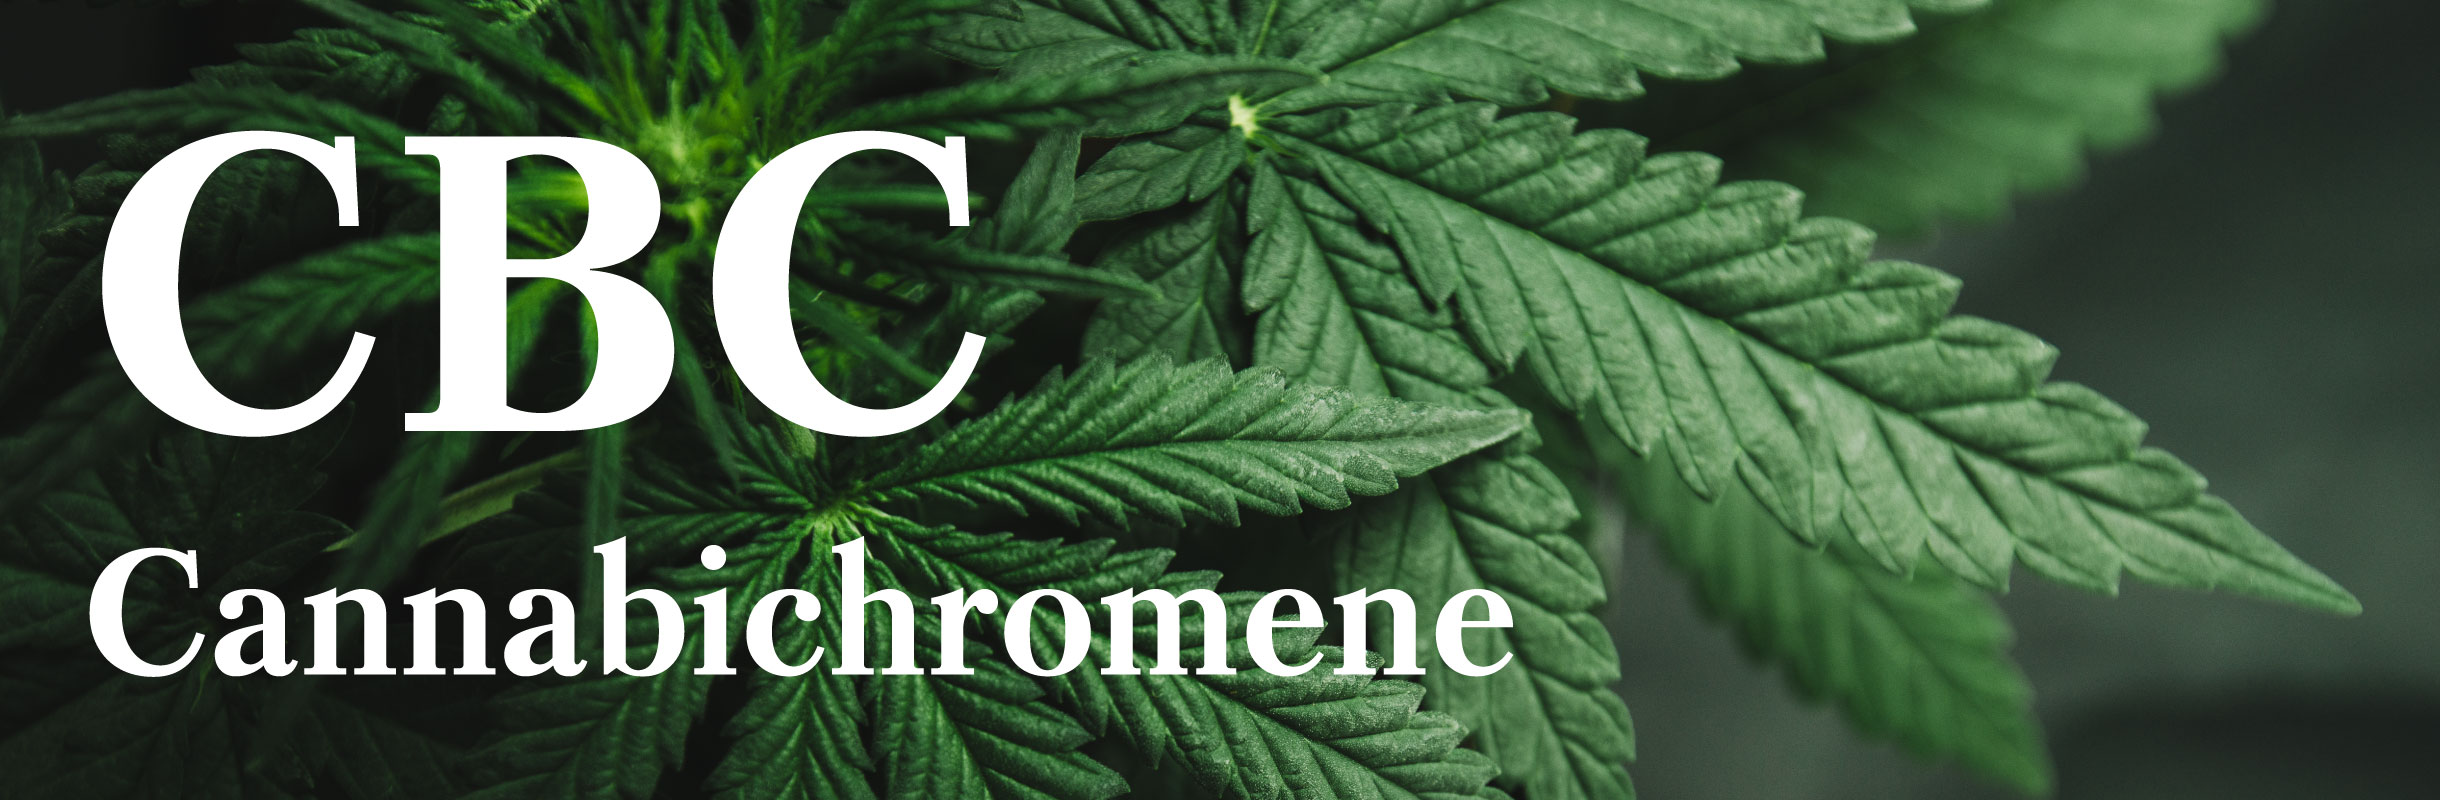 cbc-cannabichromene-header.jpg